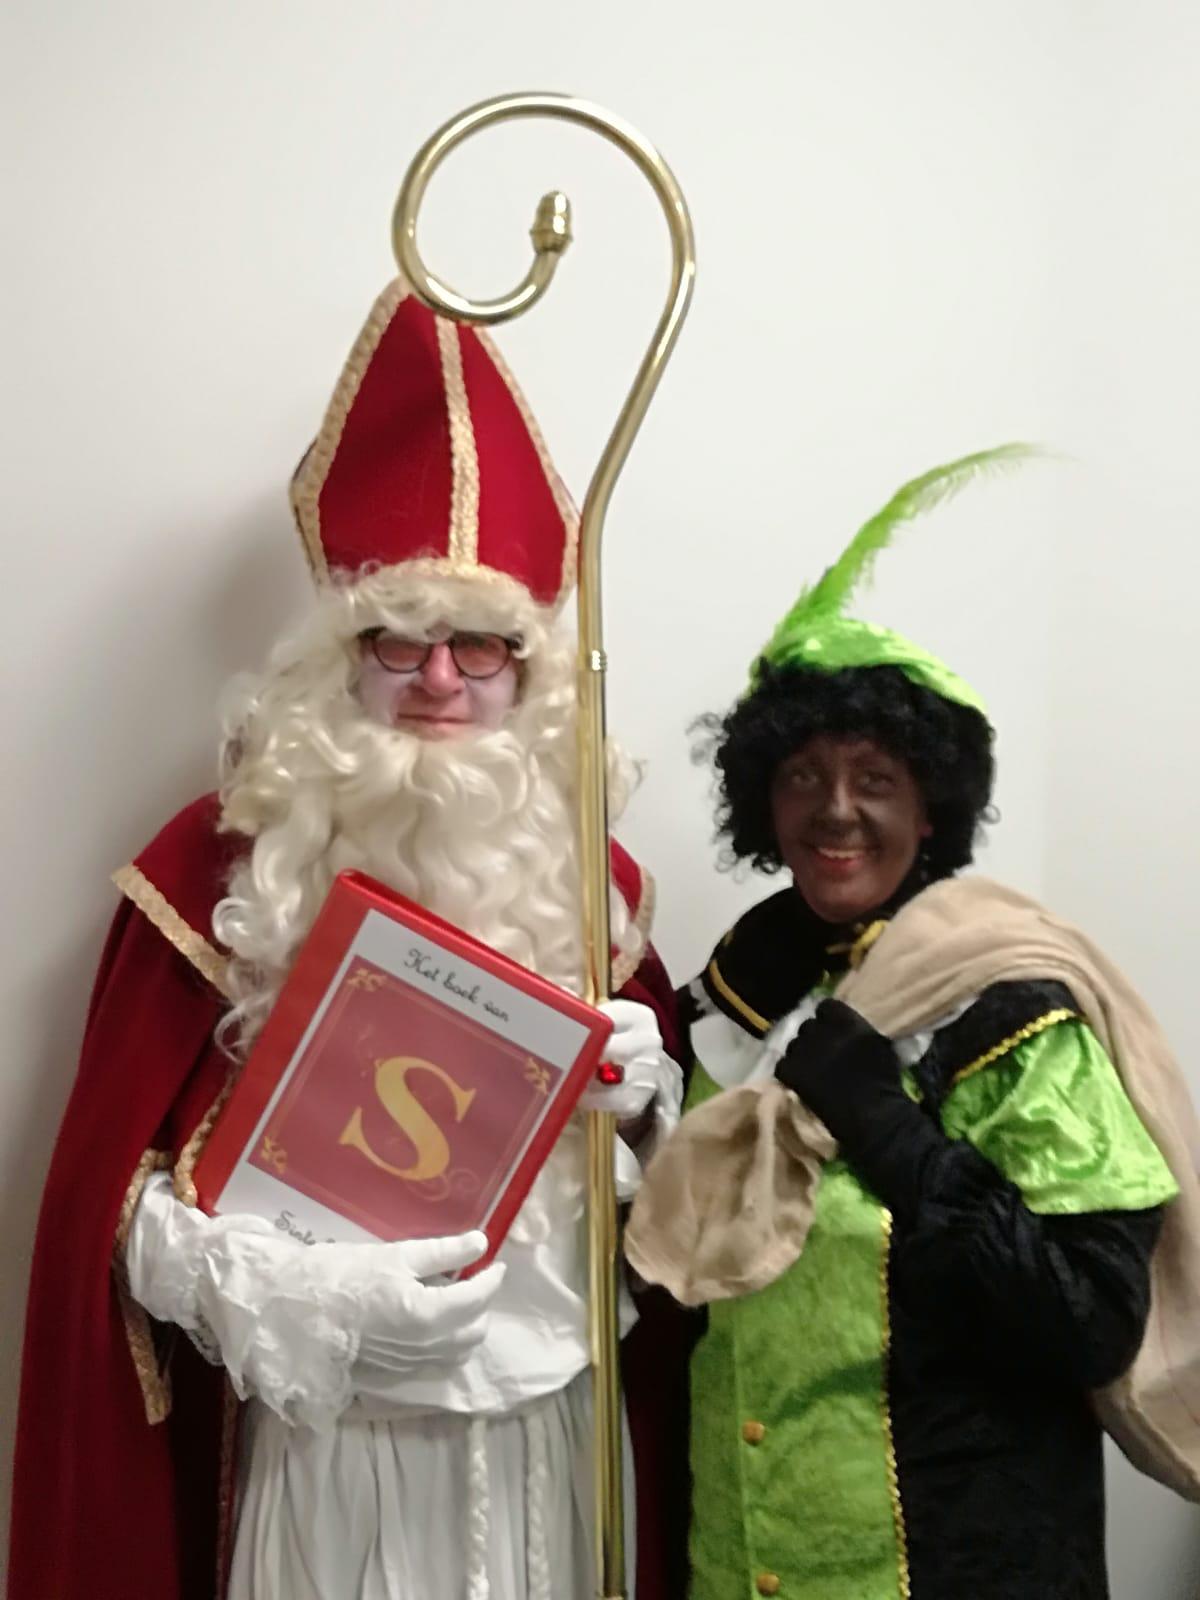 Sint en Piet Bestevaer